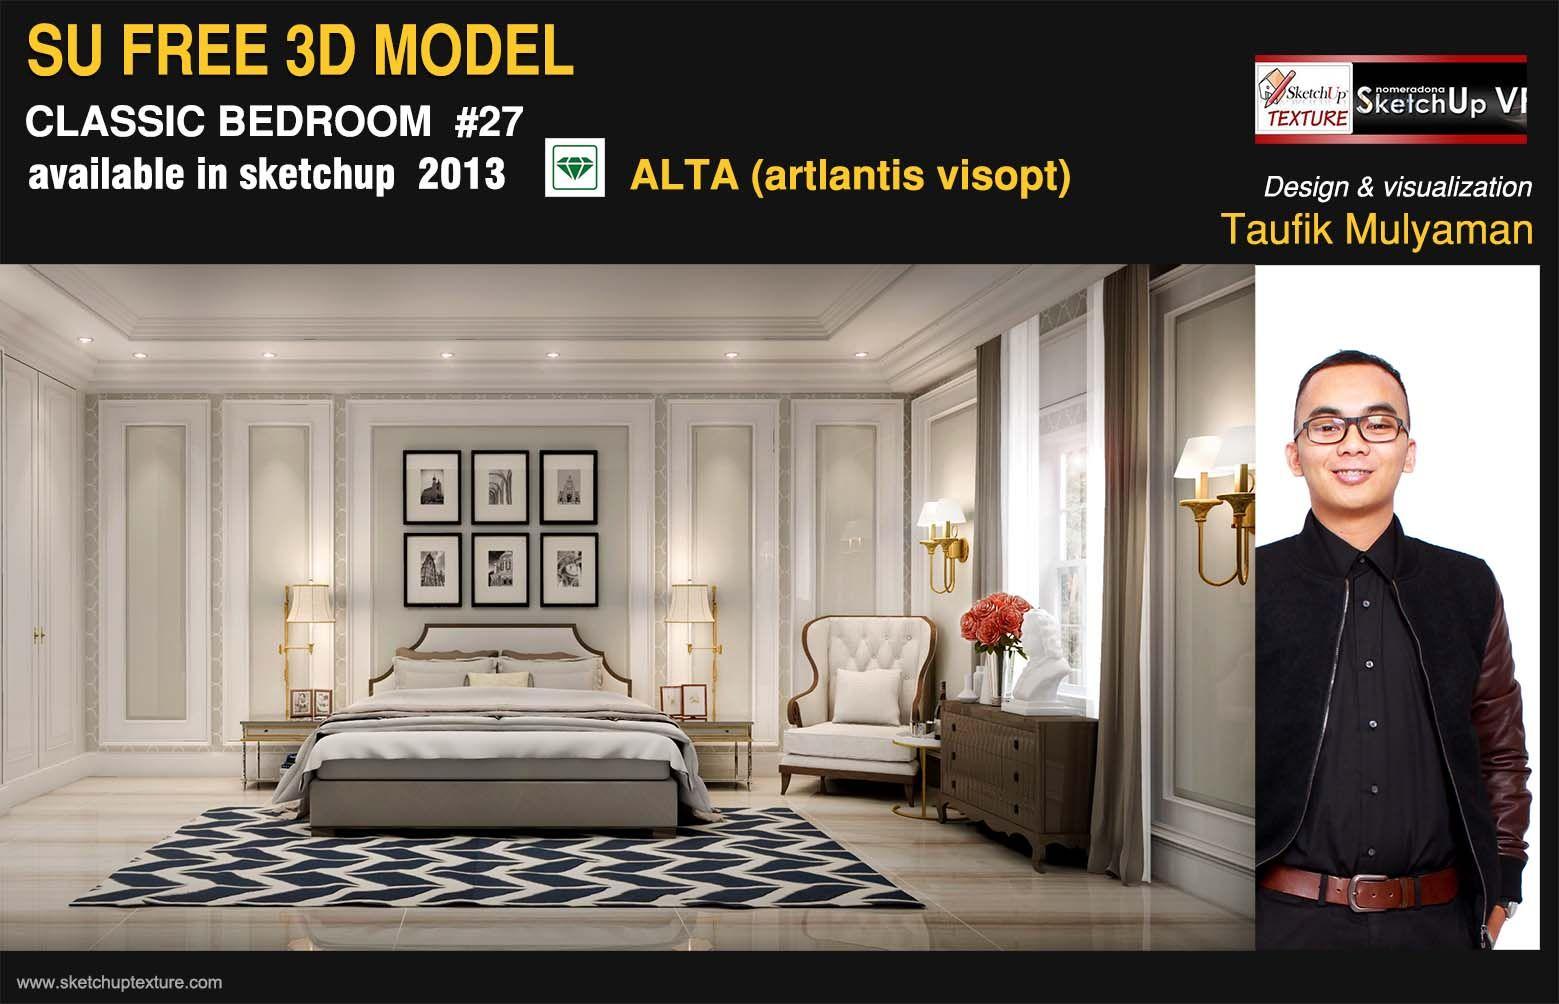 Pin di sketchup texture su sketchup free 3d models for Progetti in 3d gratis